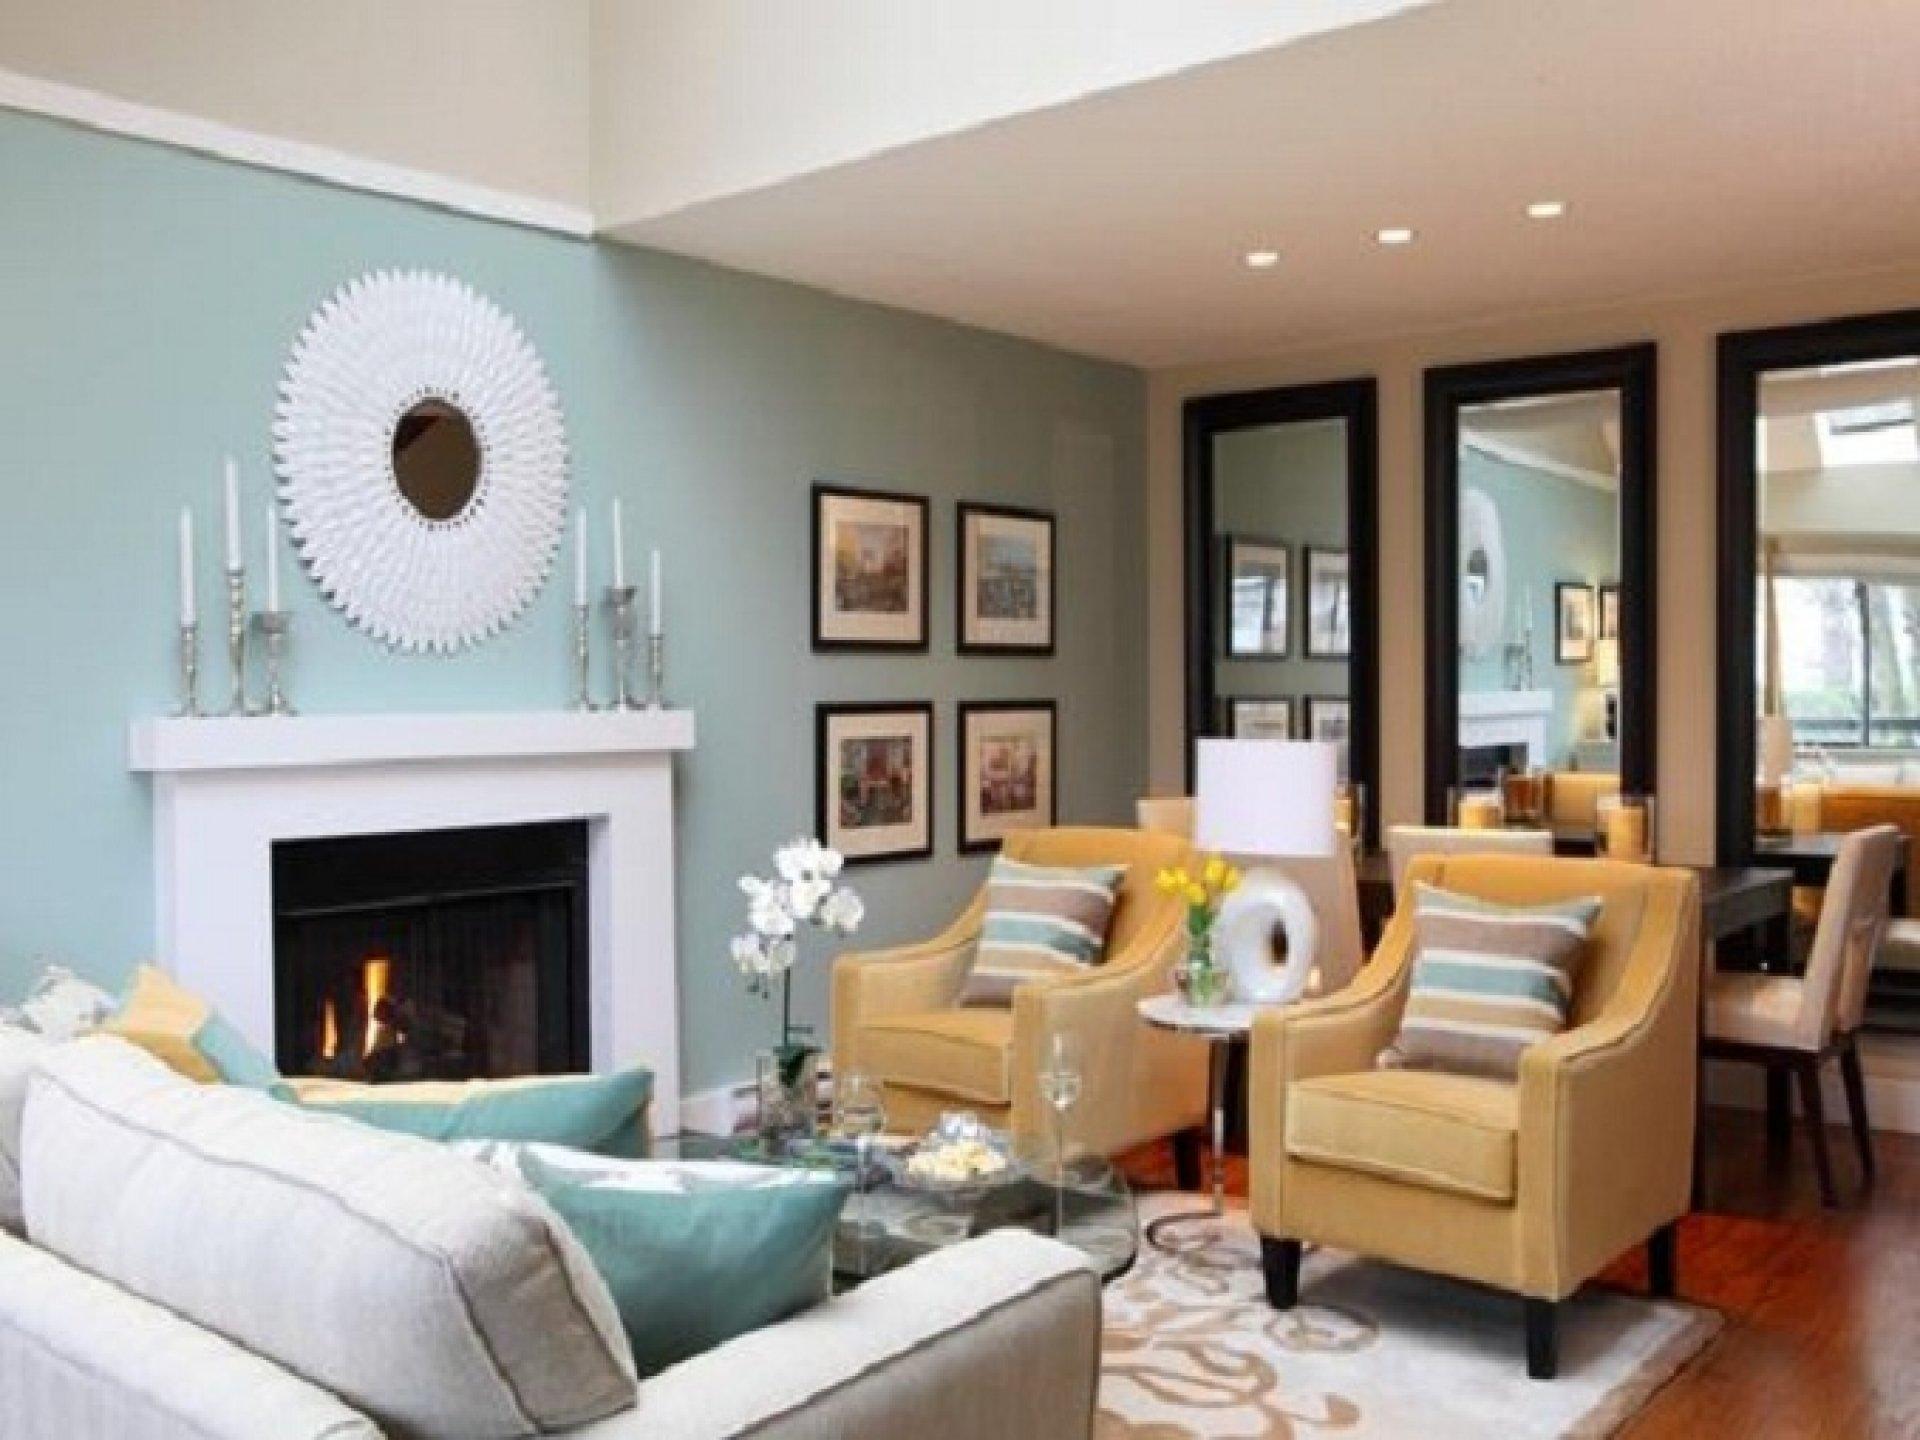 10 Stylish Living Room Color Scheme Ideas living room color schemes plus home colour ideas for living room